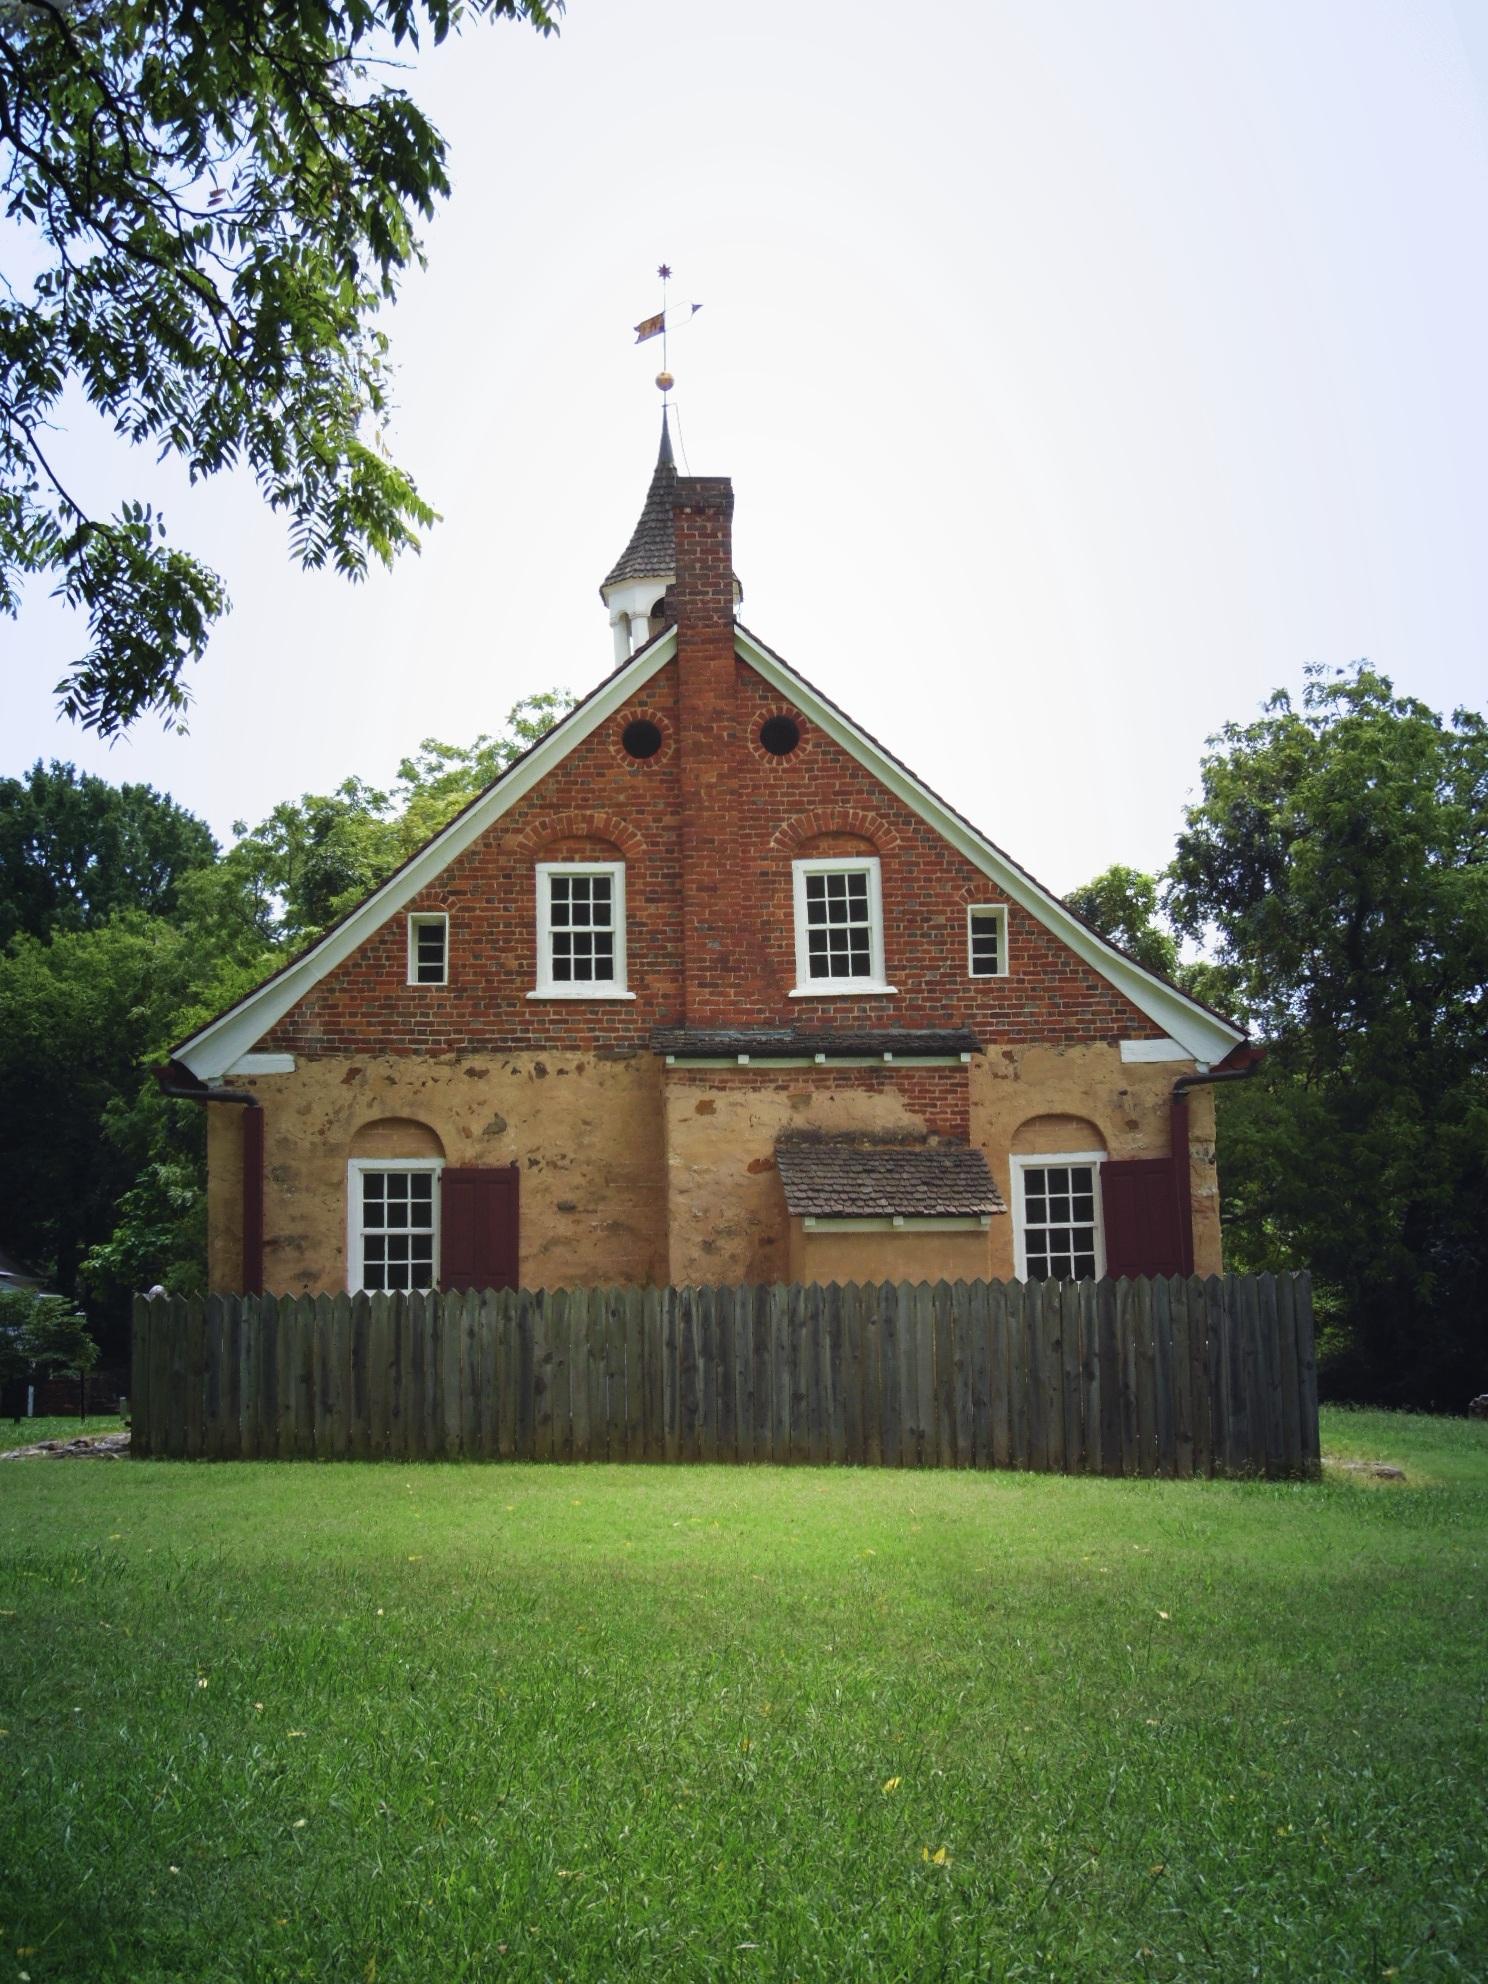 free images   architecture  farm  vintage  building  chateau  barn  home  cottage  usa  landmark